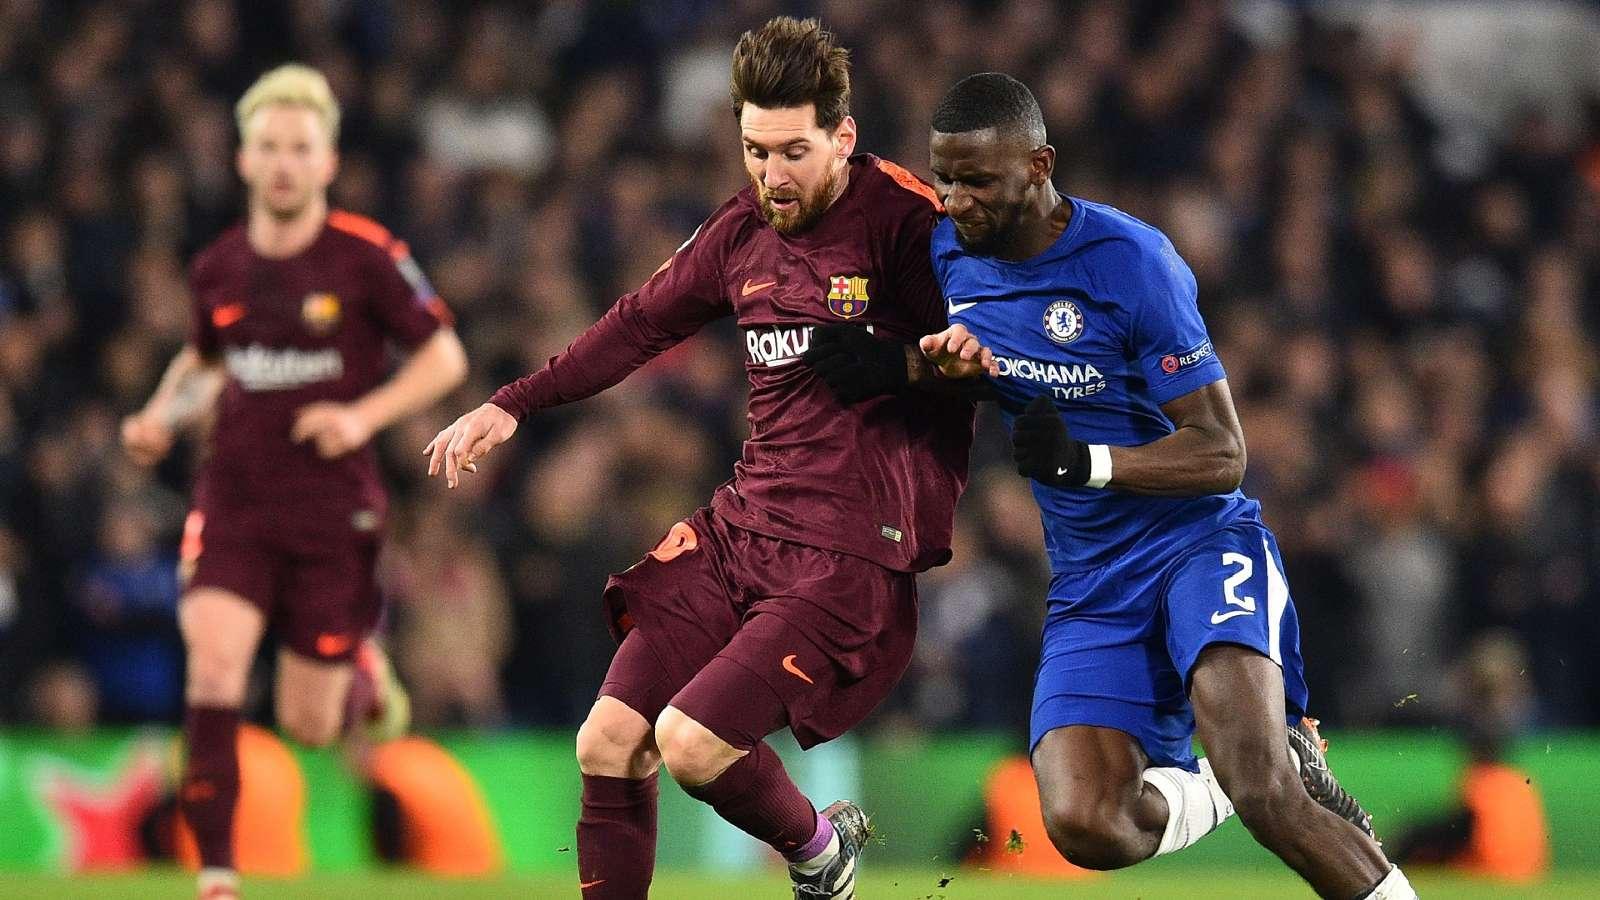 Cesc Fabregas Bantu Antonio Rudiger Dapatkan Jersey Lionel Messi